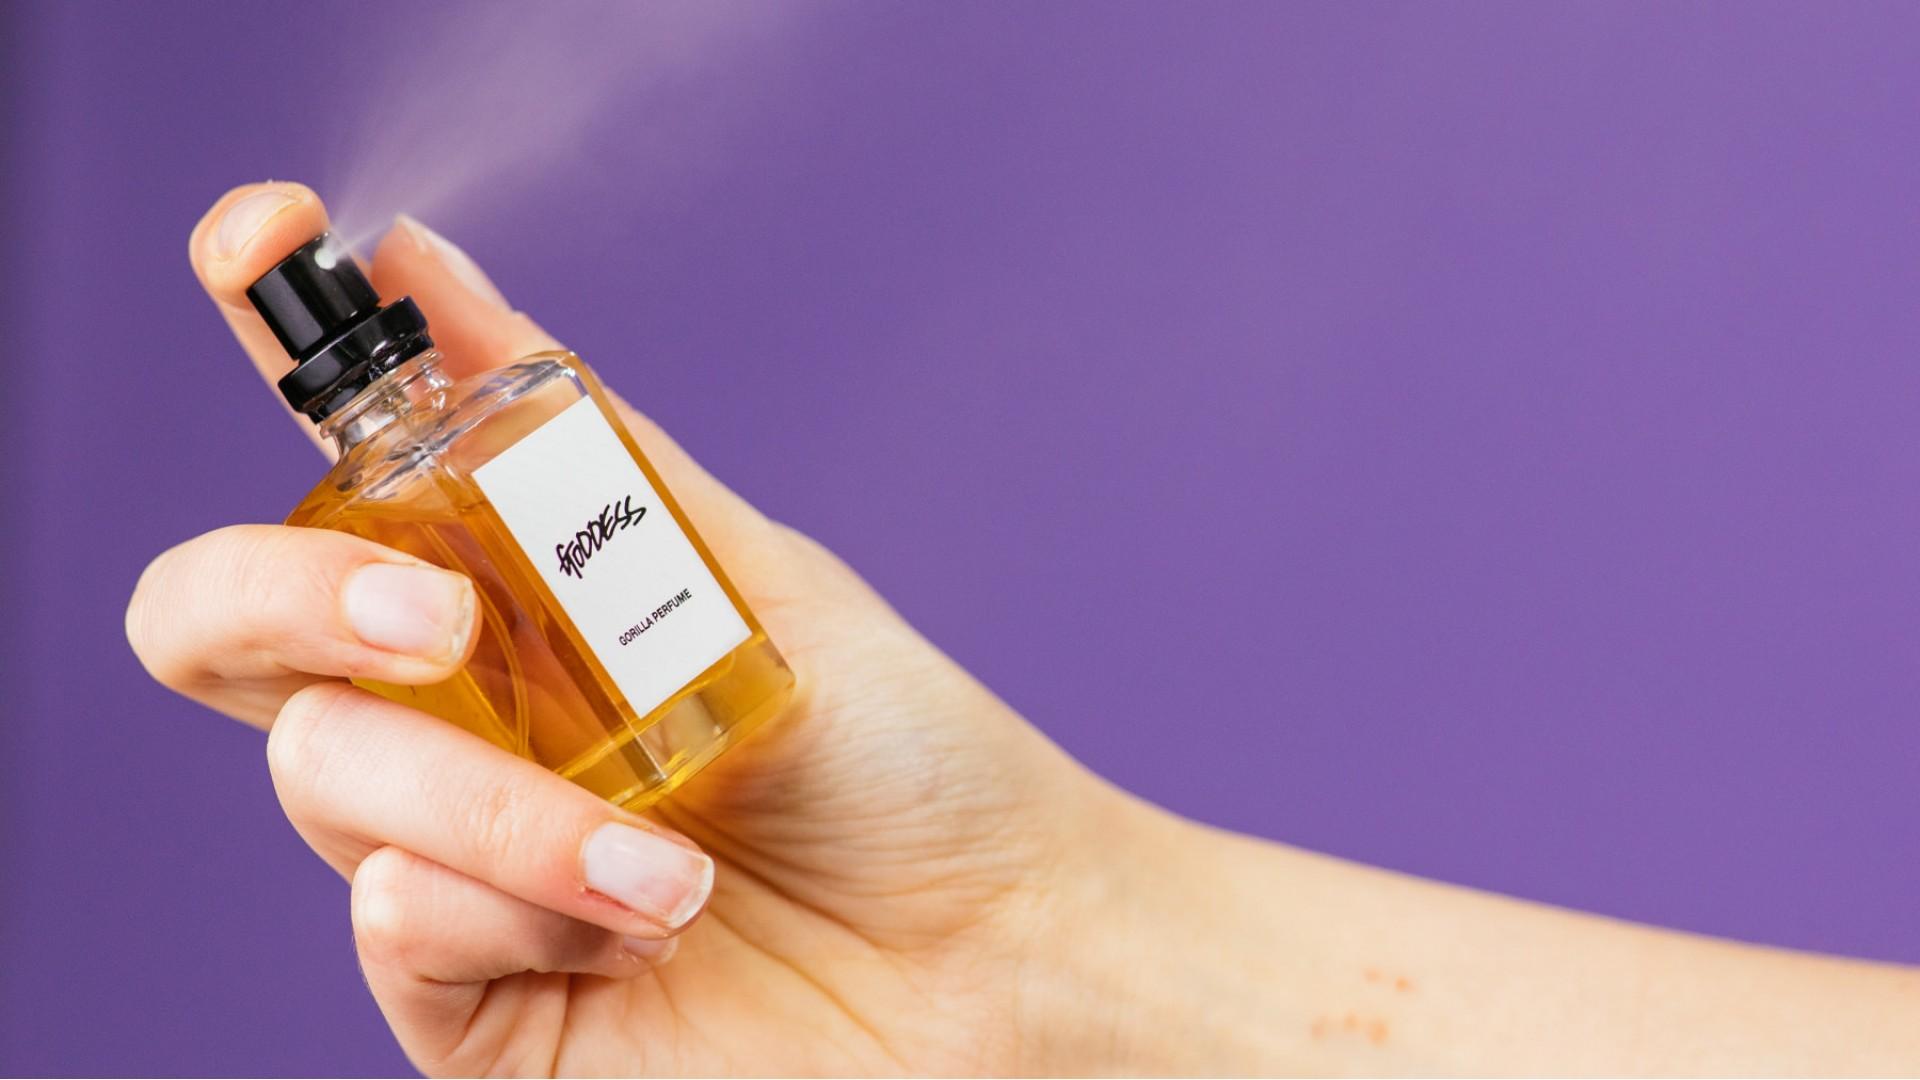 Nauka o dobrom raspoloženju: Psihologija mirisa kod profesora Nila Martina